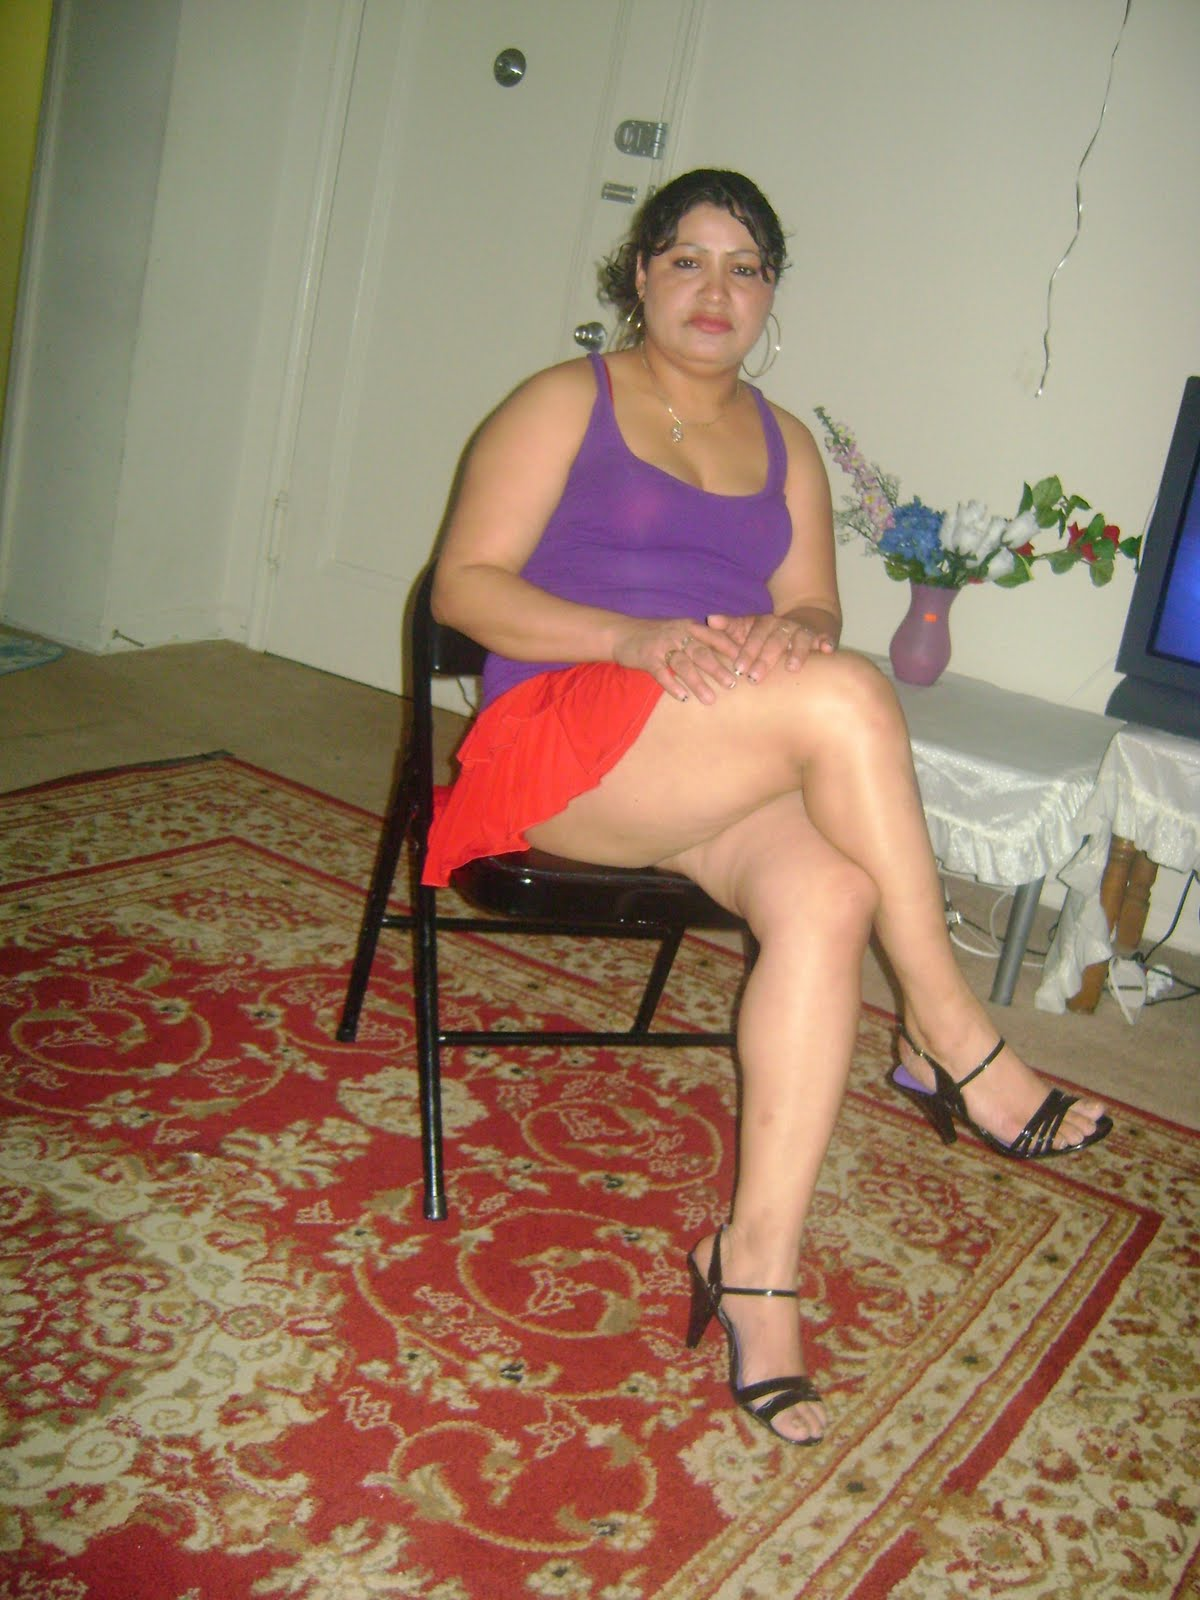 2012 upskirt teen 8 nice frontal 2